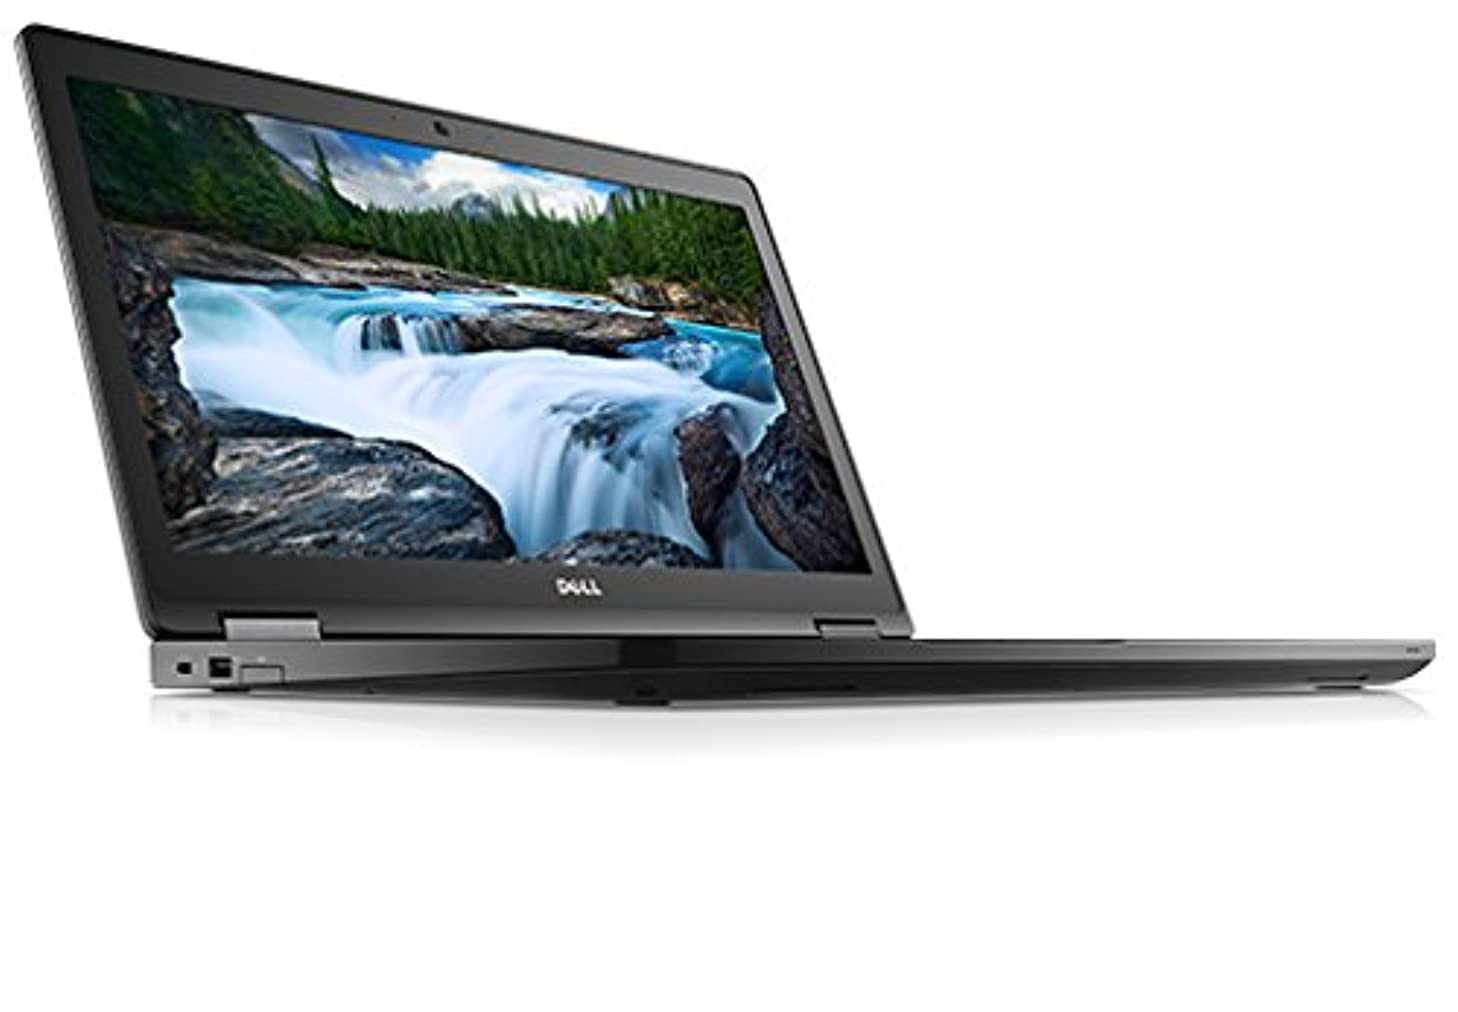 Dell XNH36 Latitude 5580 Laptop, 15.6